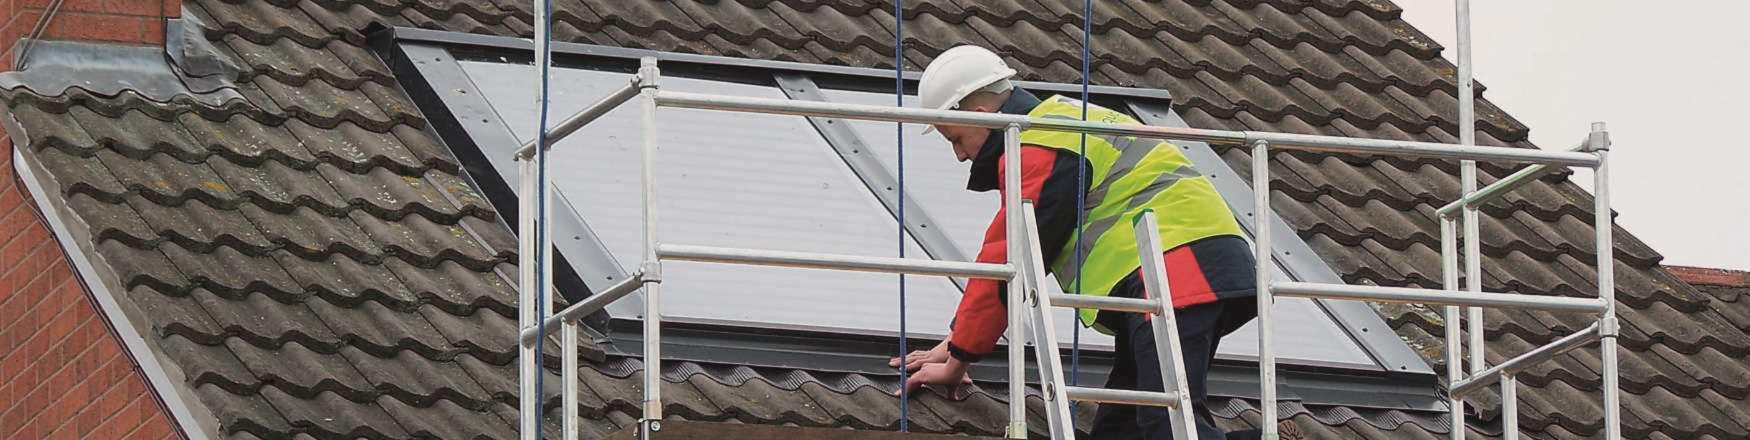 Easi-Dec Work Platform for Solar Installation